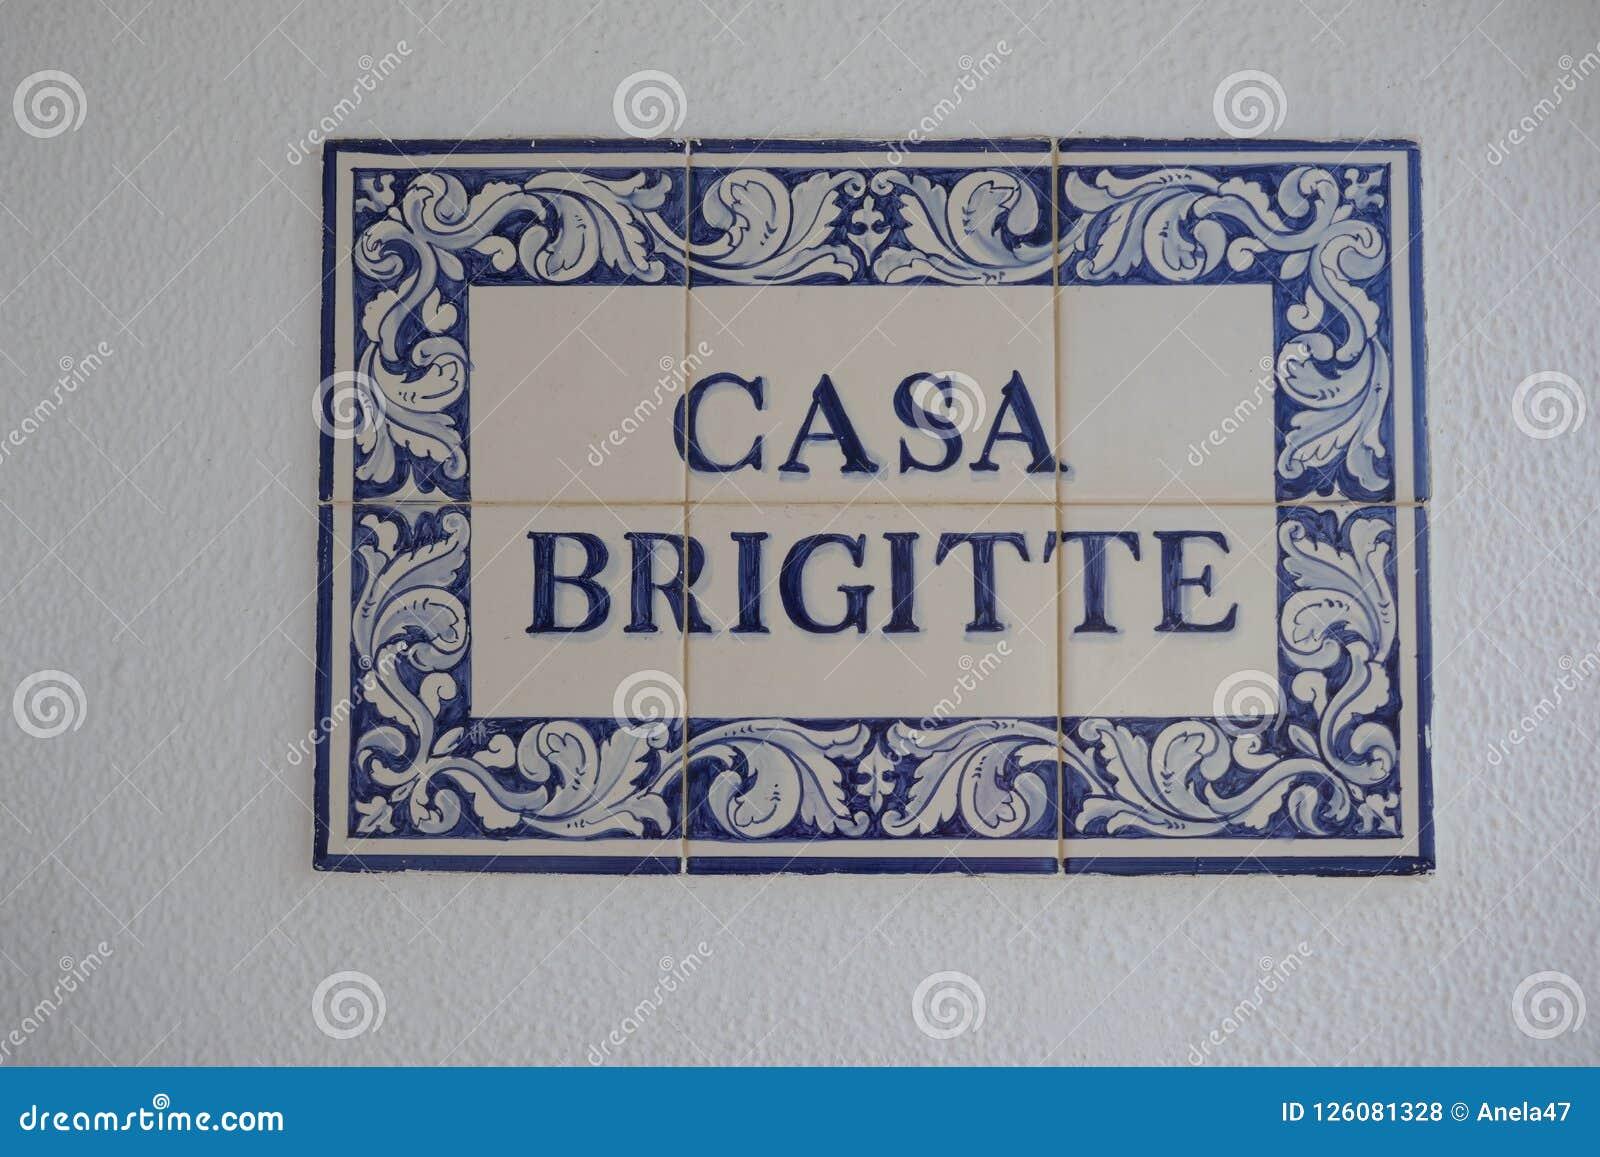 Baldosas cerámicas de BRIGITTE de la CASA, portuguesas o españolas, llamadas azulejos